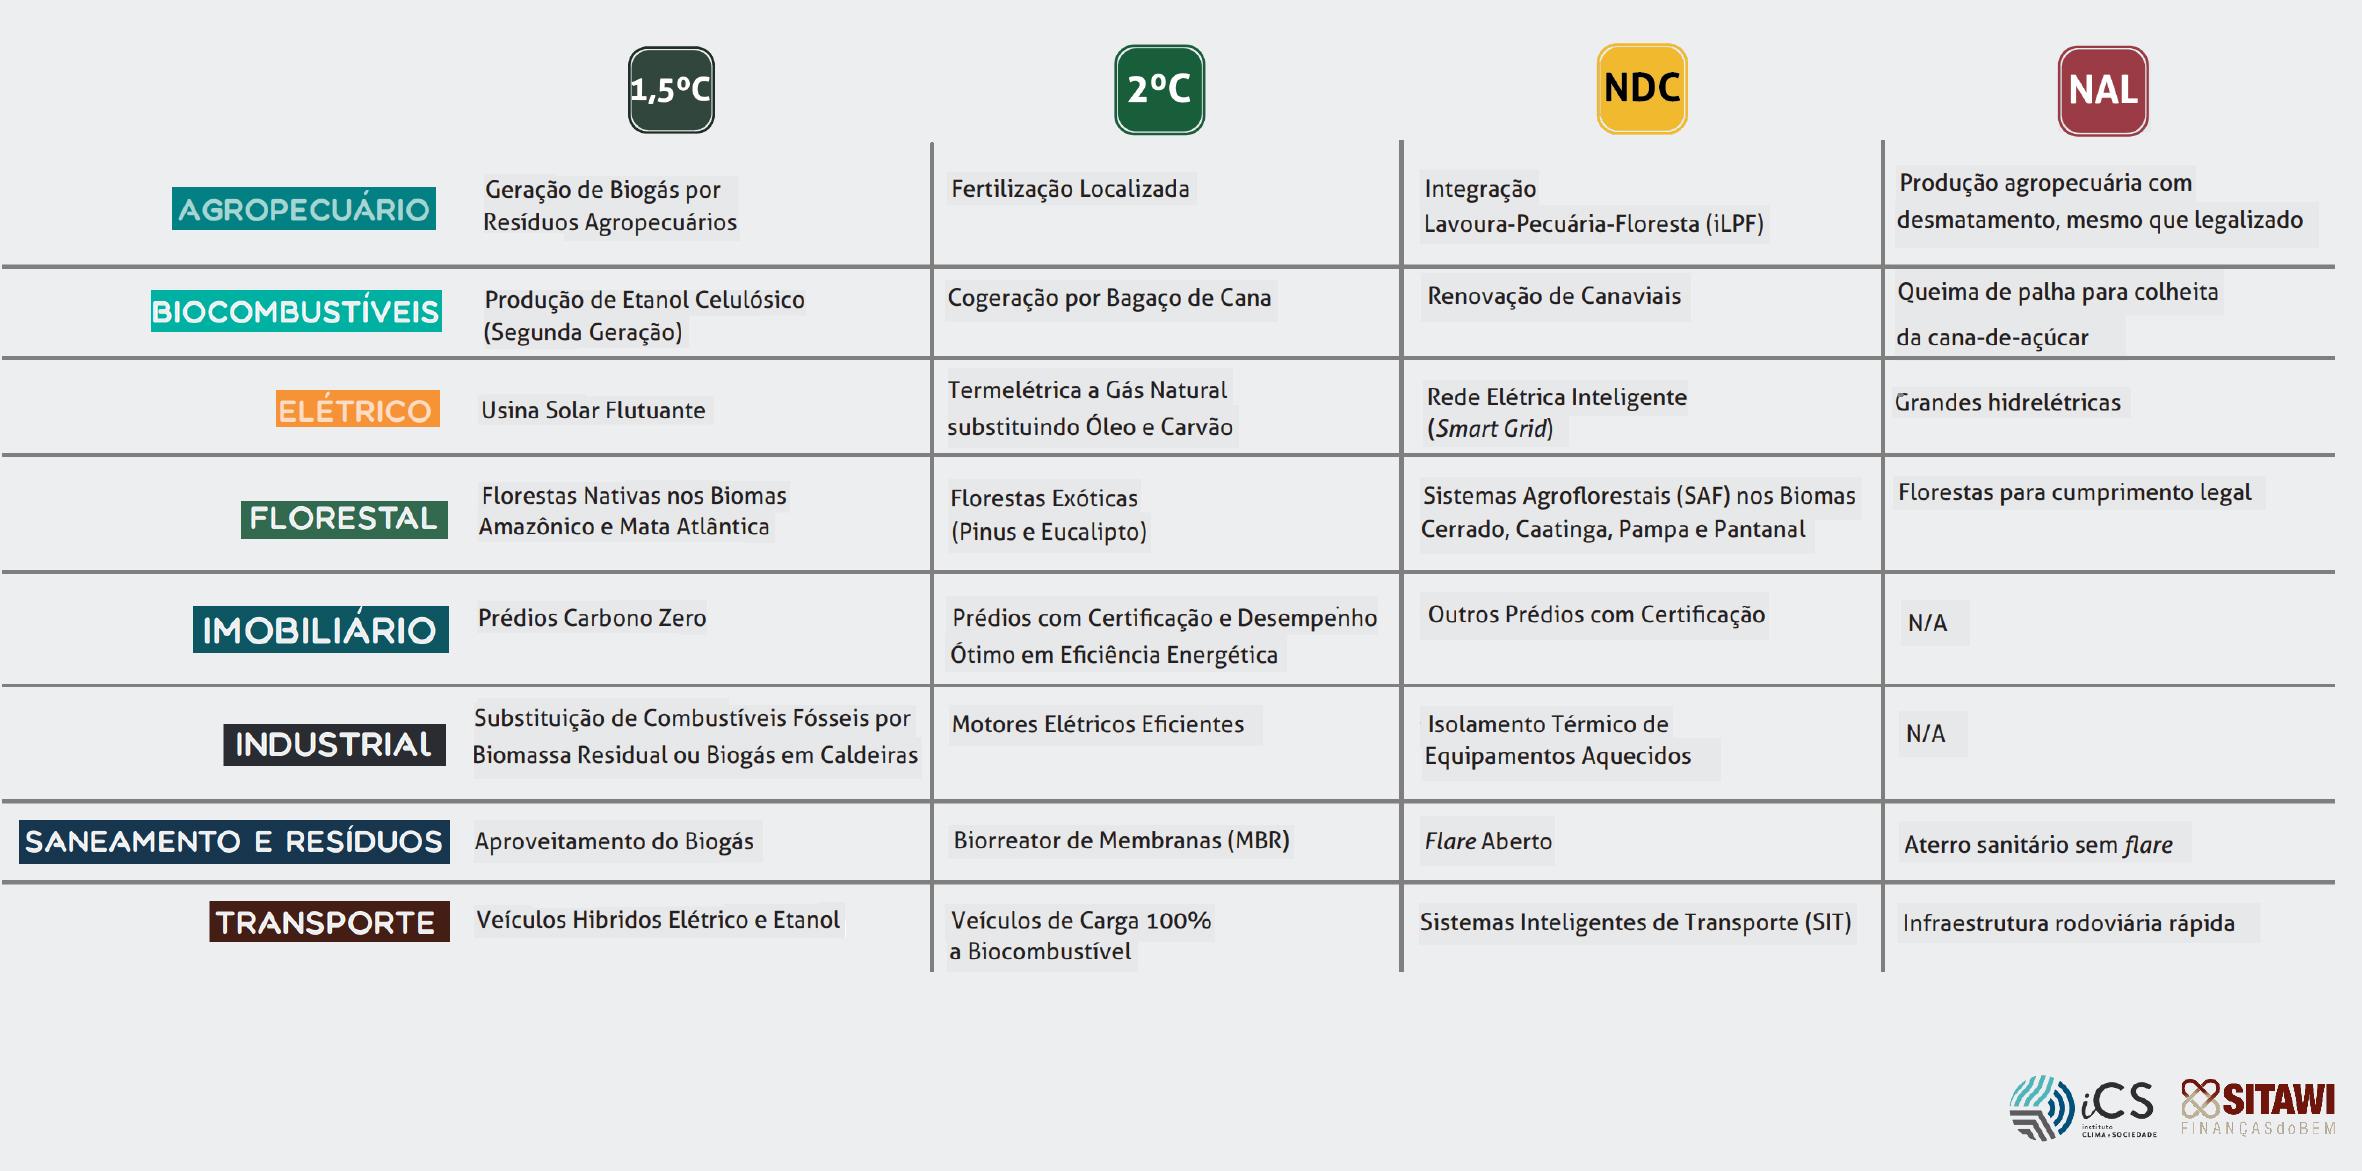 destaques_naopercaessebond